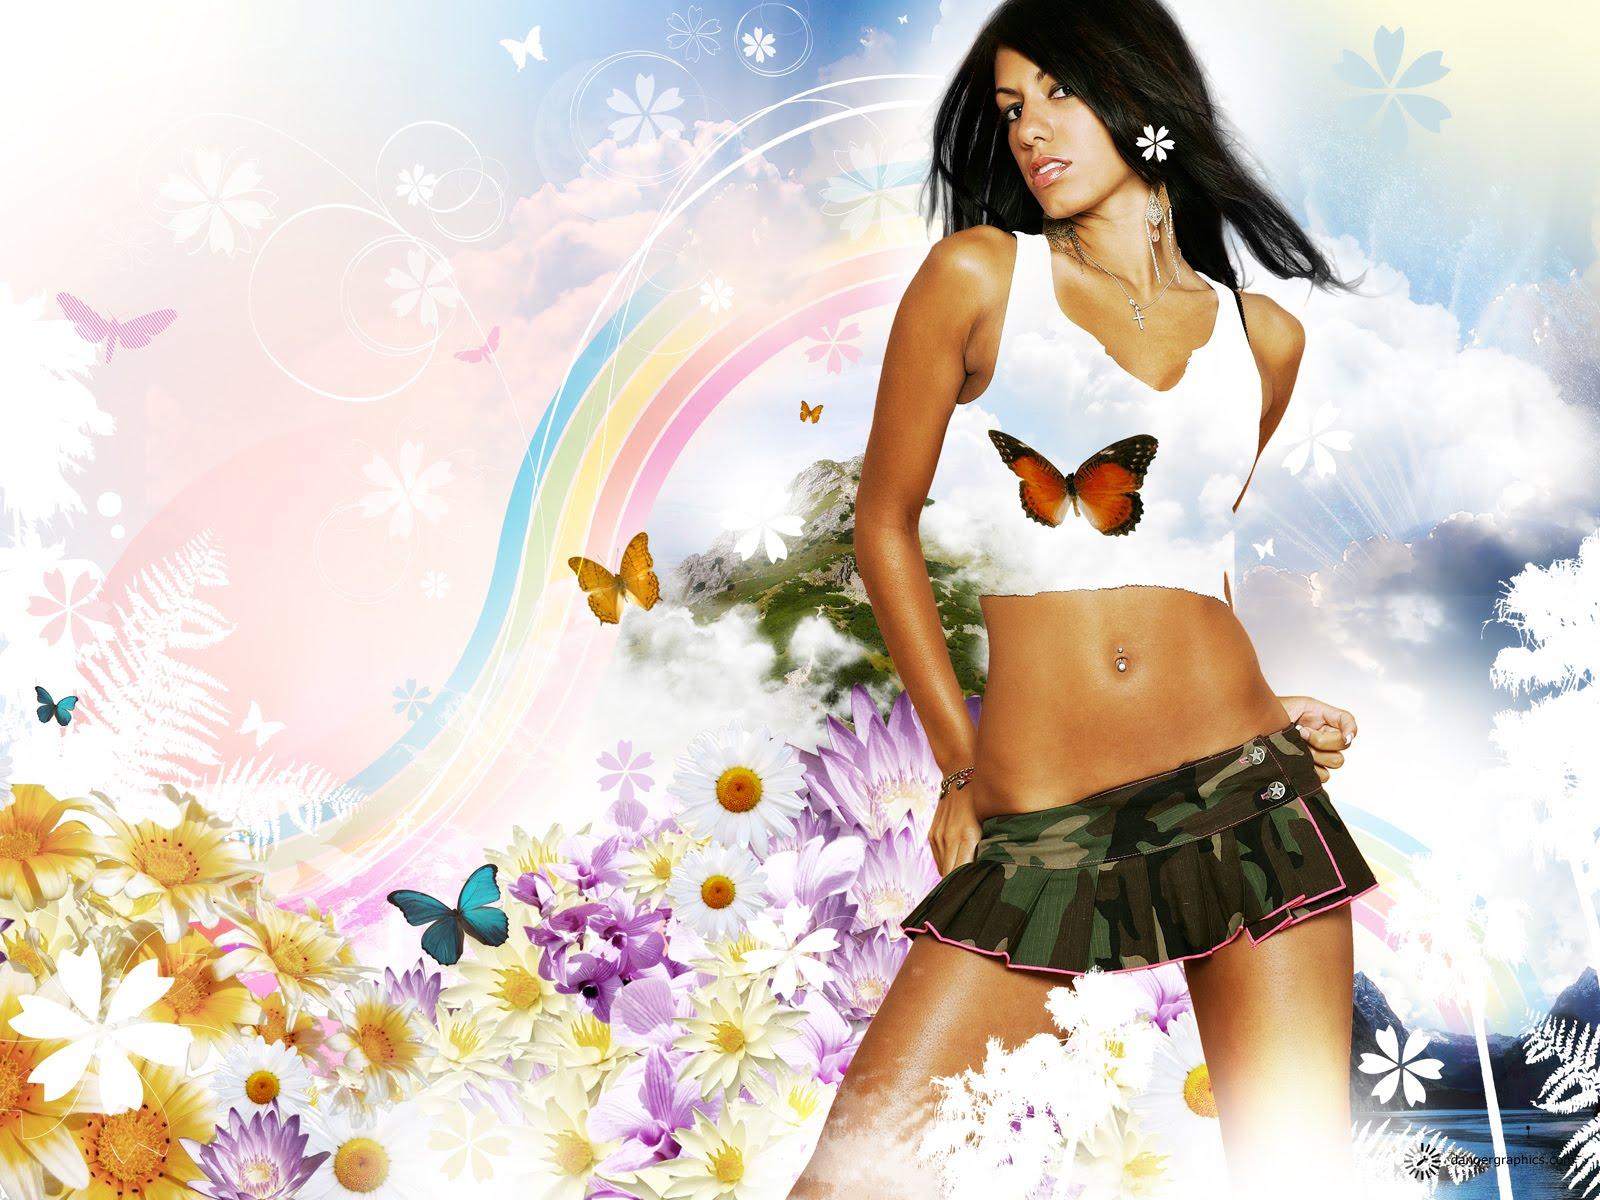 http://2.bp.blogspot.com/_p_7U3SKop3A/TI4RaMVFtdI/AAAAAAAAATM/Dpr7NigDVus/s1600/BeautyStyle005-1.jpg